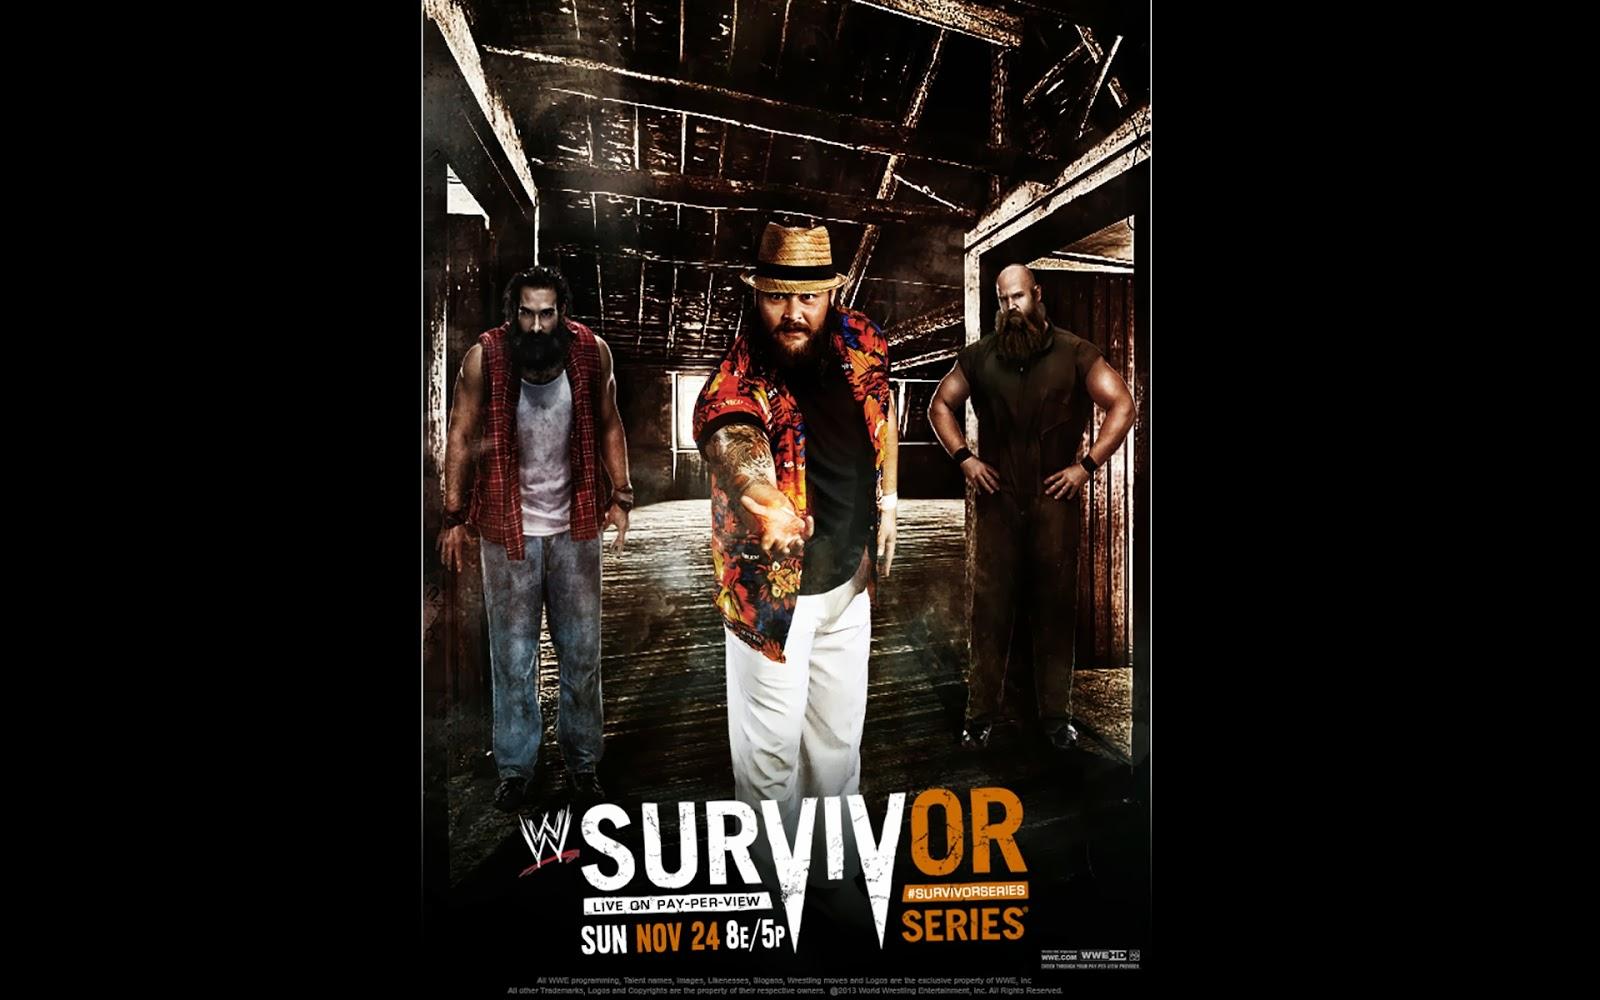 Wwe Survivor Series 2013 Poster Ravishment: Sur...